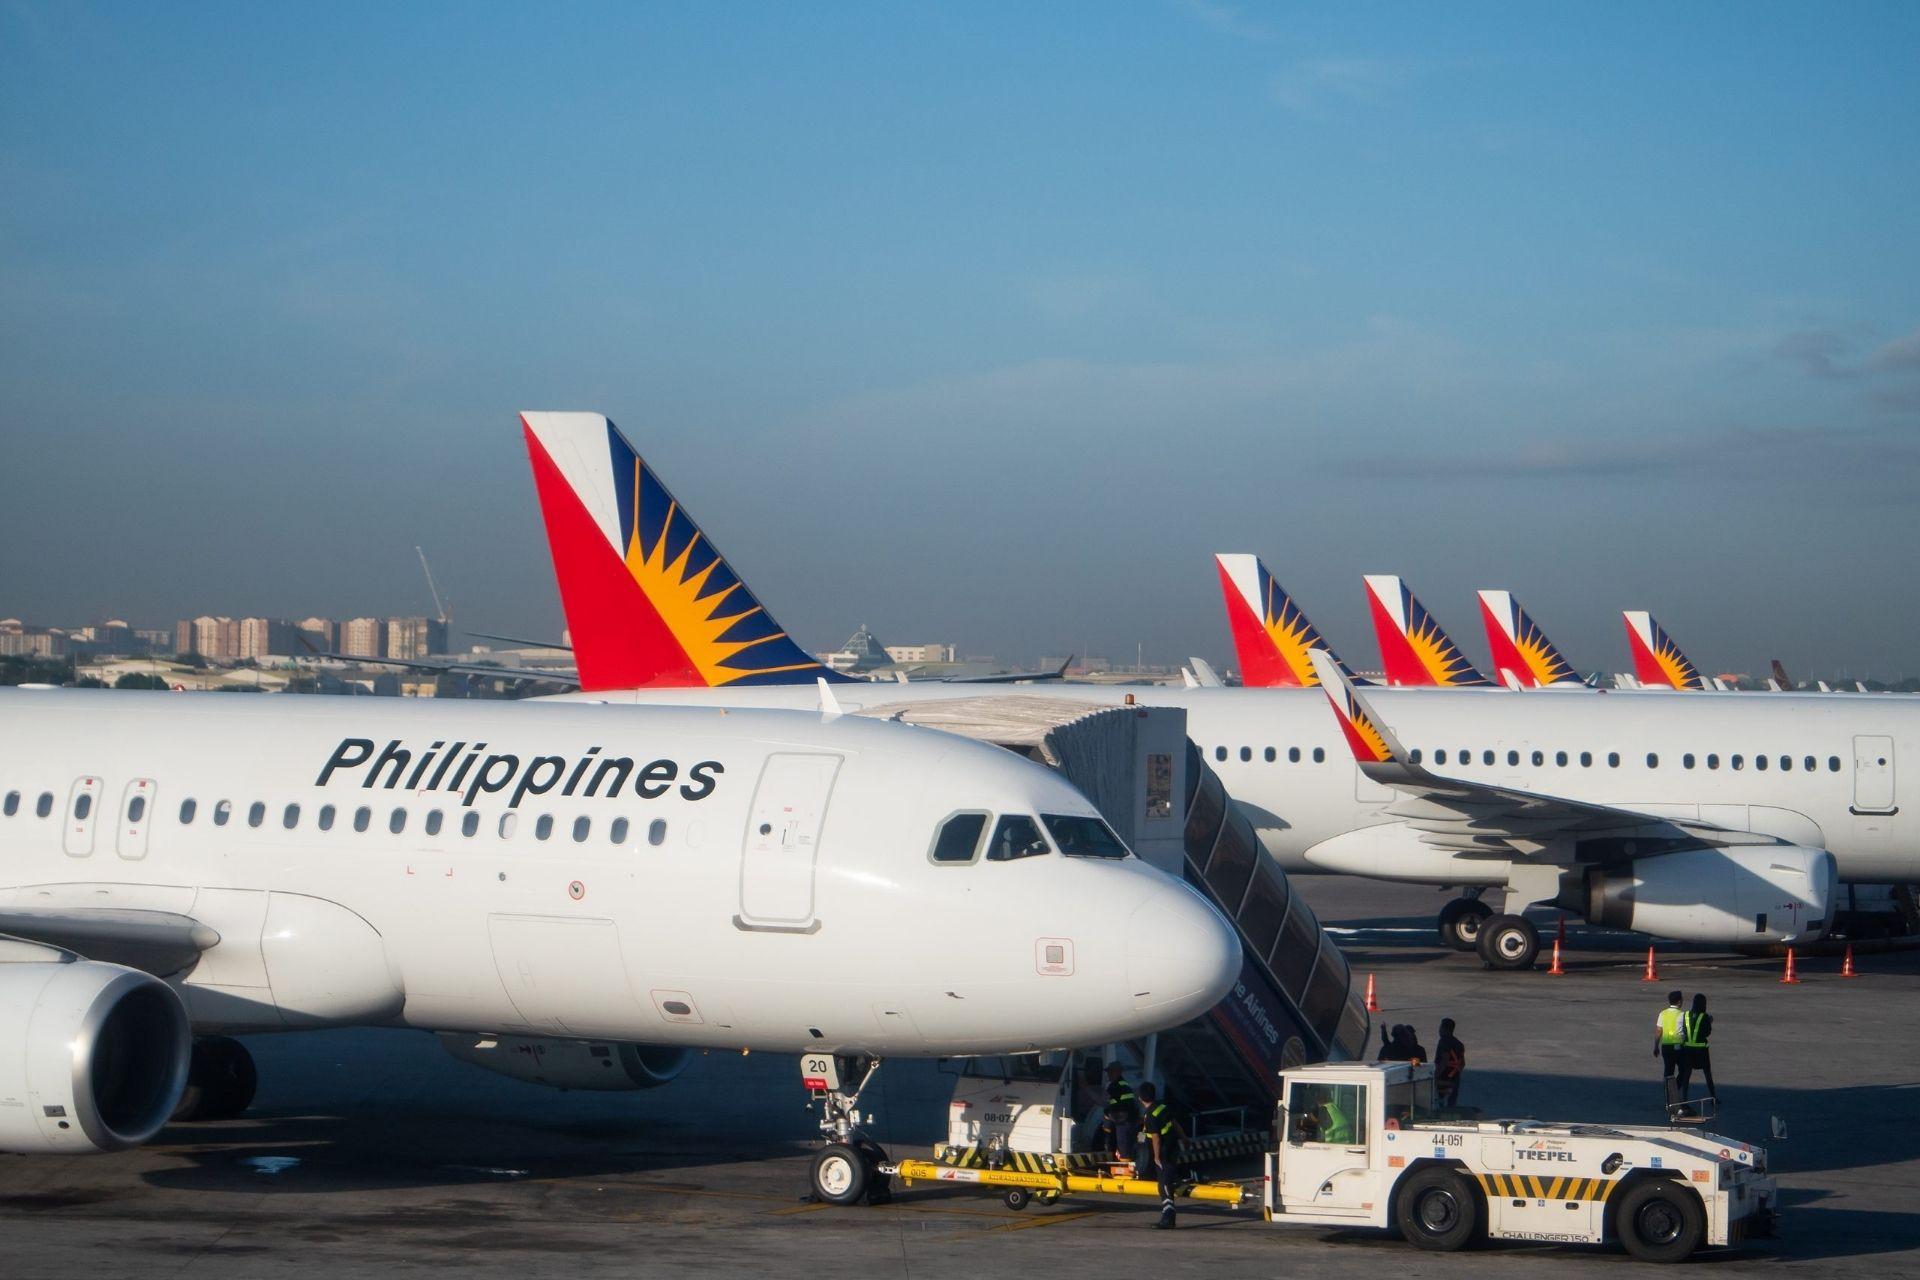 Philippine Airlines planes